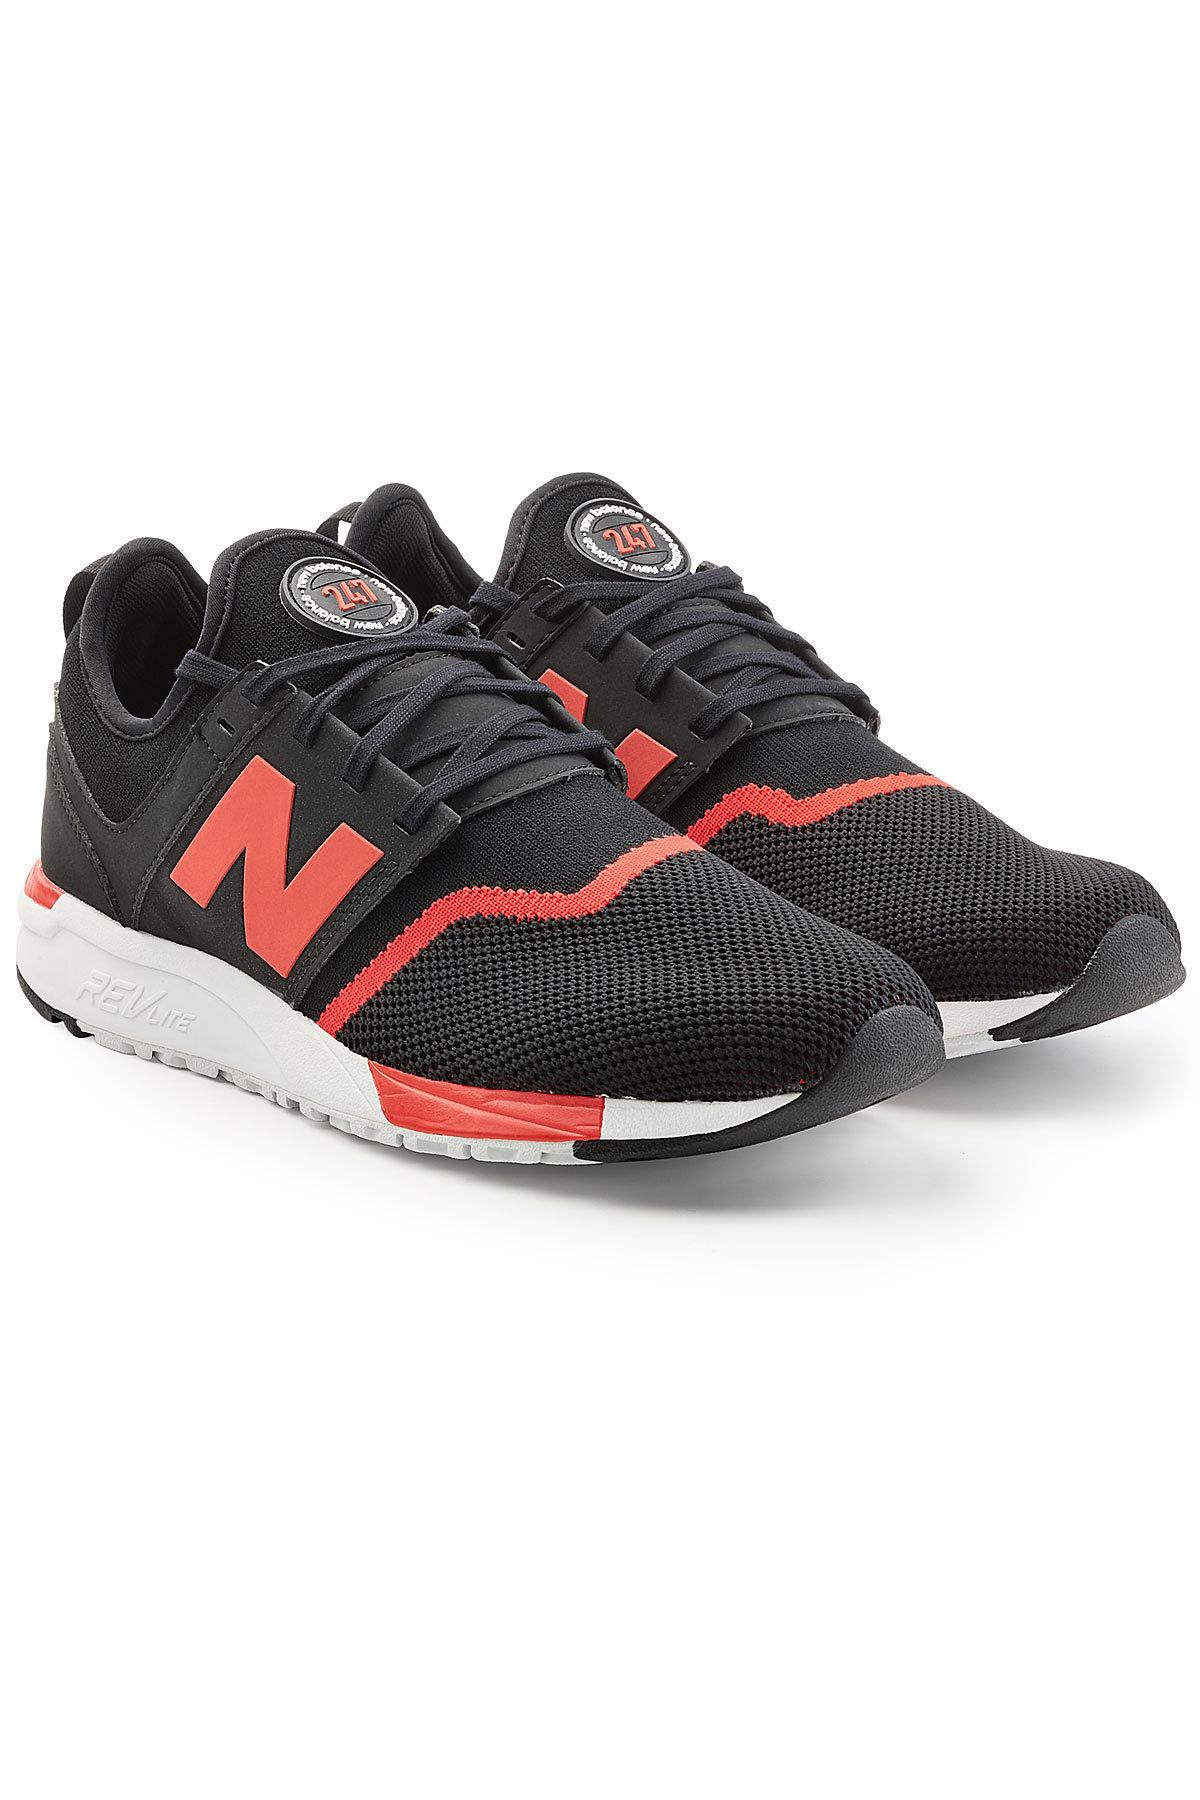 New Balance Mrl247 Sport D Sneakers In Black